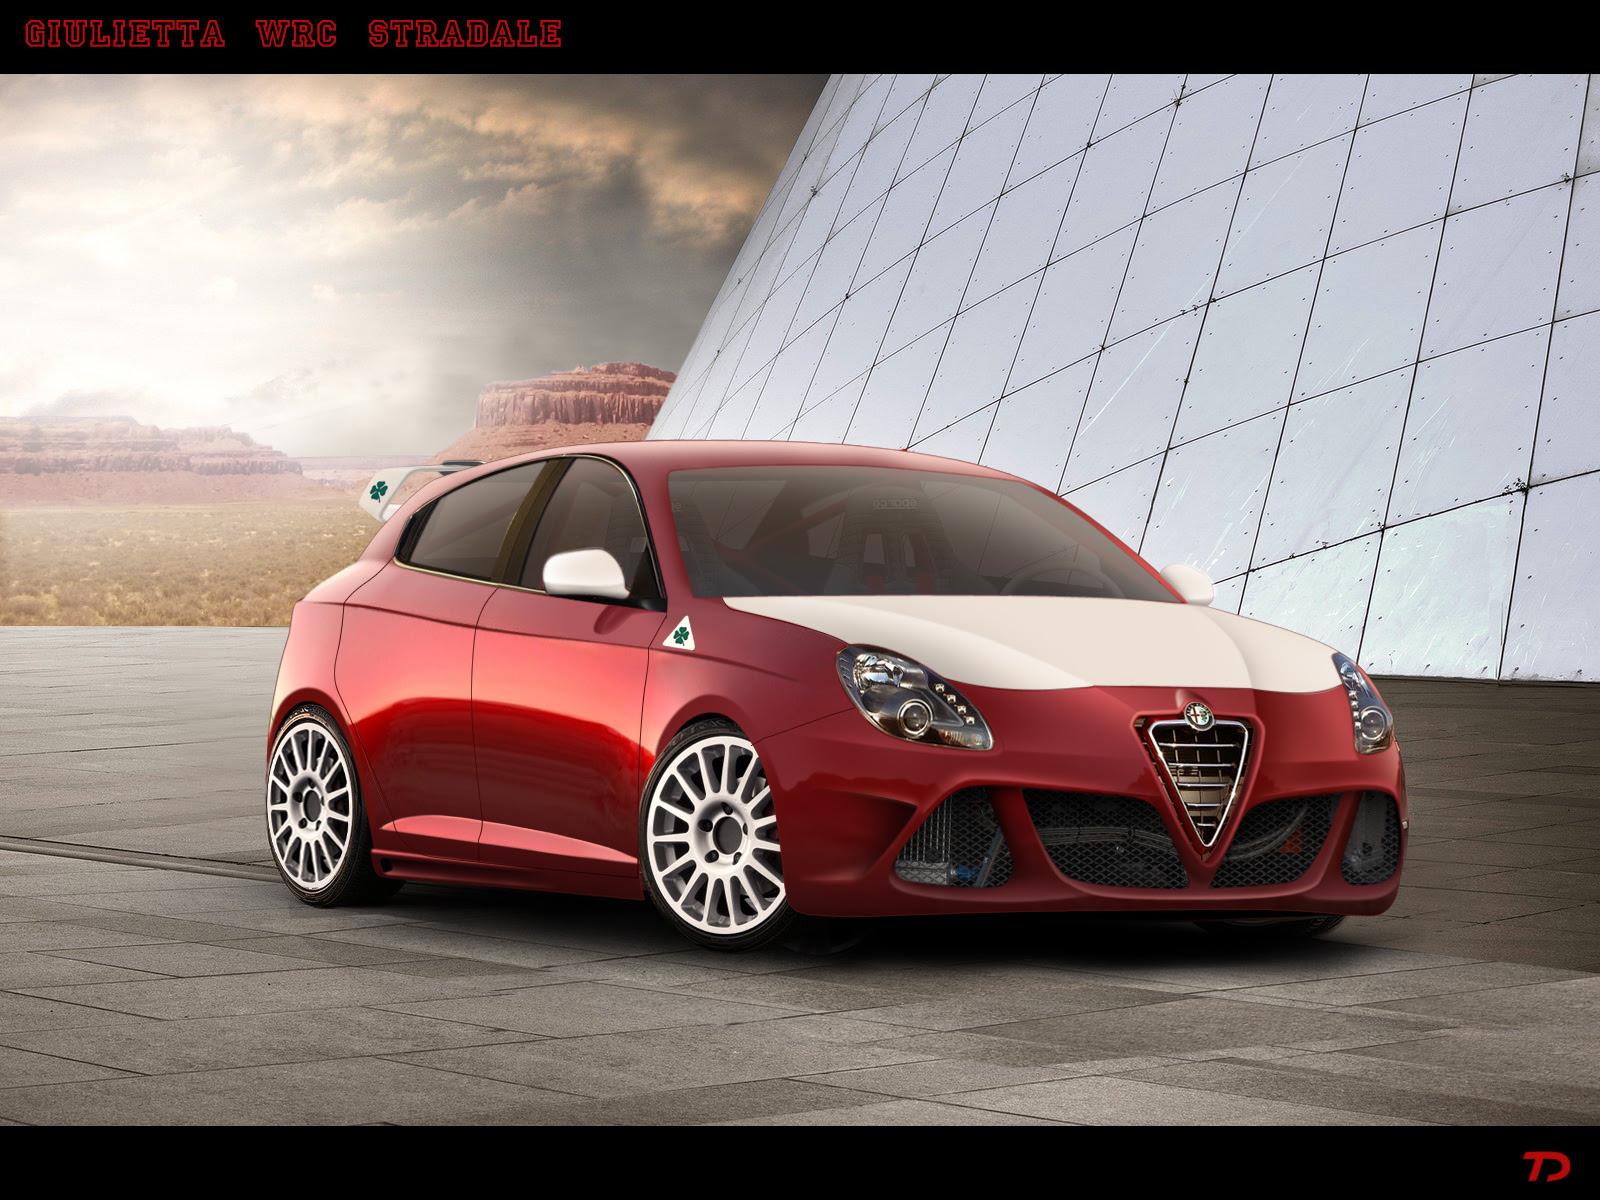 Alfa Romeo Giulietta WRC Stradale by TeofiloDesign on DeviantArt